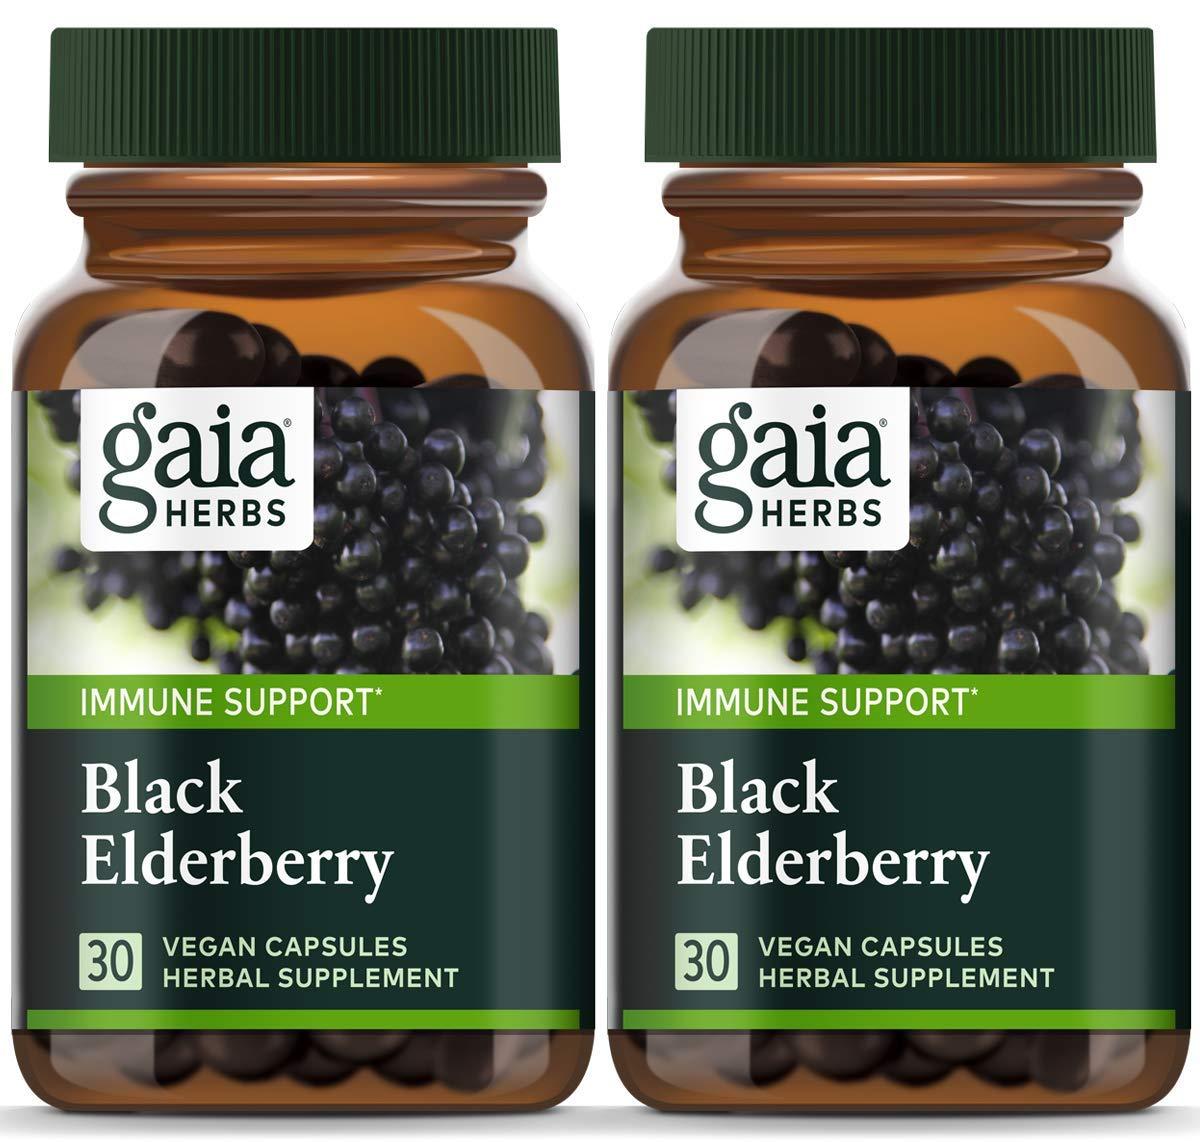 Gaia Herbs, Black Elderberry, Organic Sambucus Elderberry Extract for Daily Immune and Antioxidant Support, Vegan Powder Capsules, 30 Count (Pack of 2)